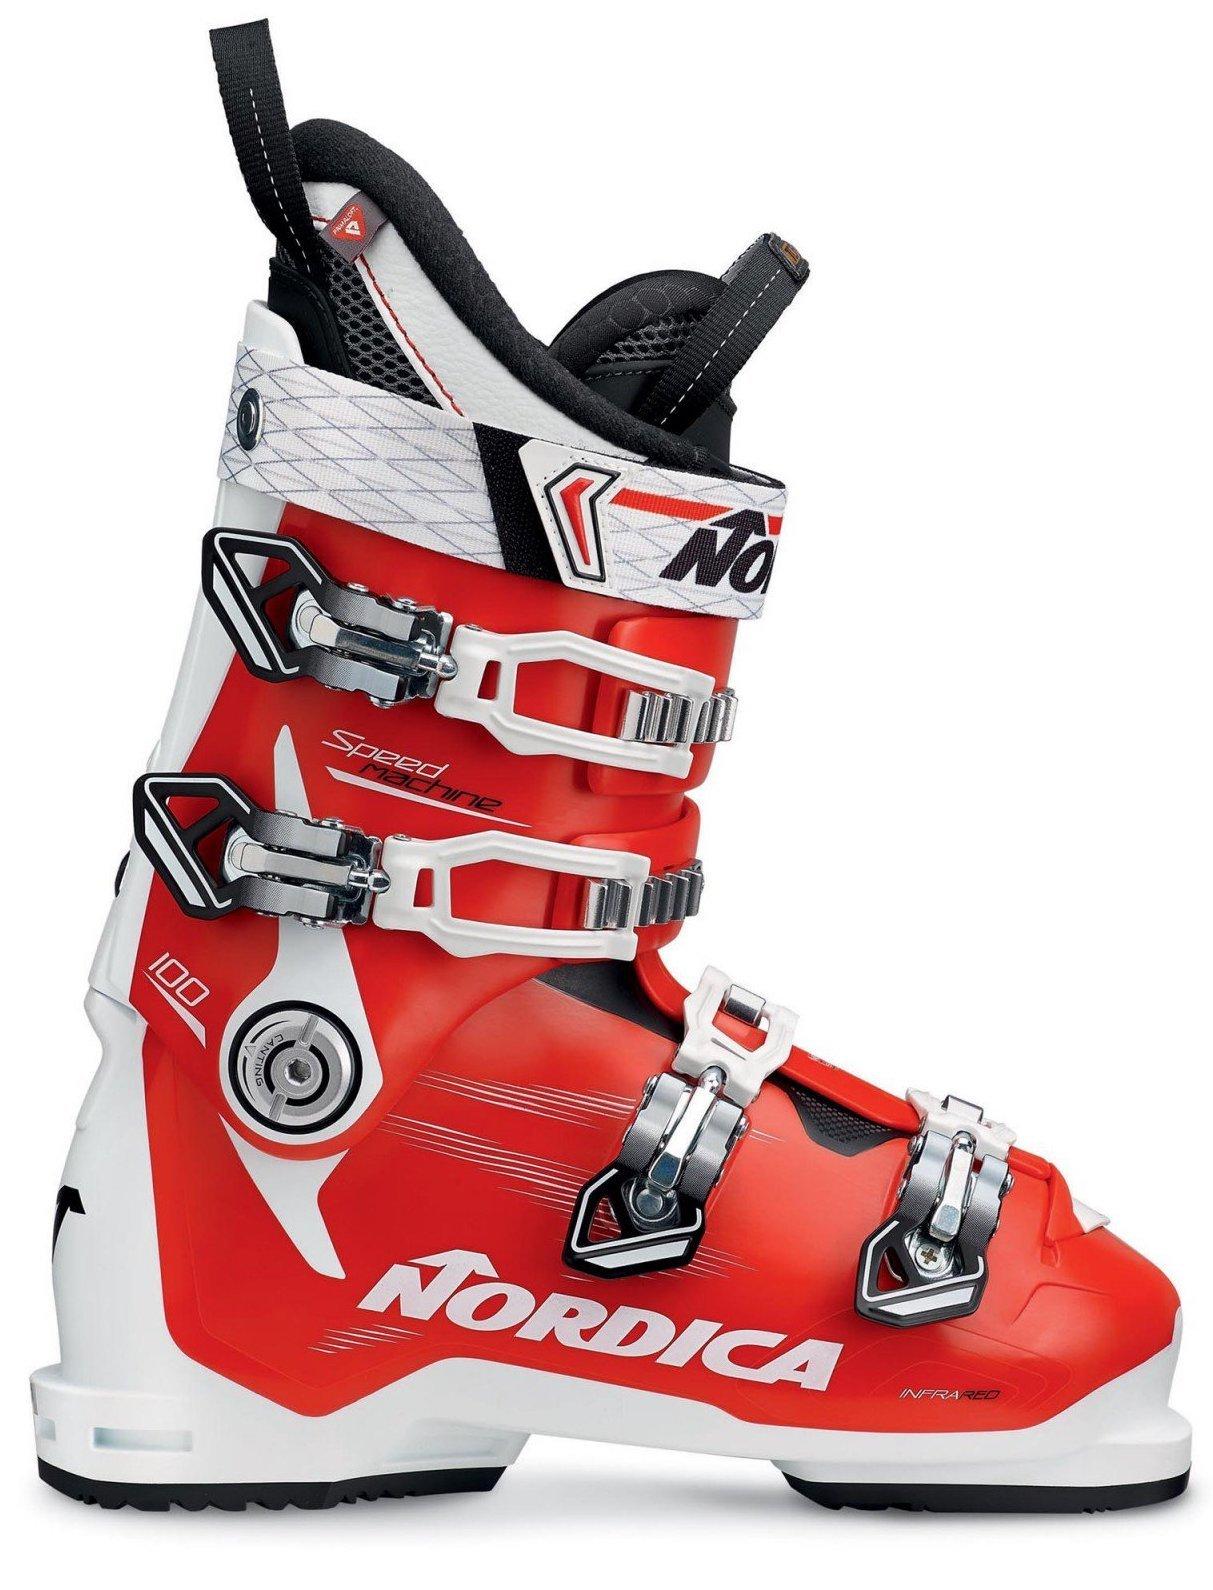 Nordica Speedmachine 100 - Sportby 2f36adb3772